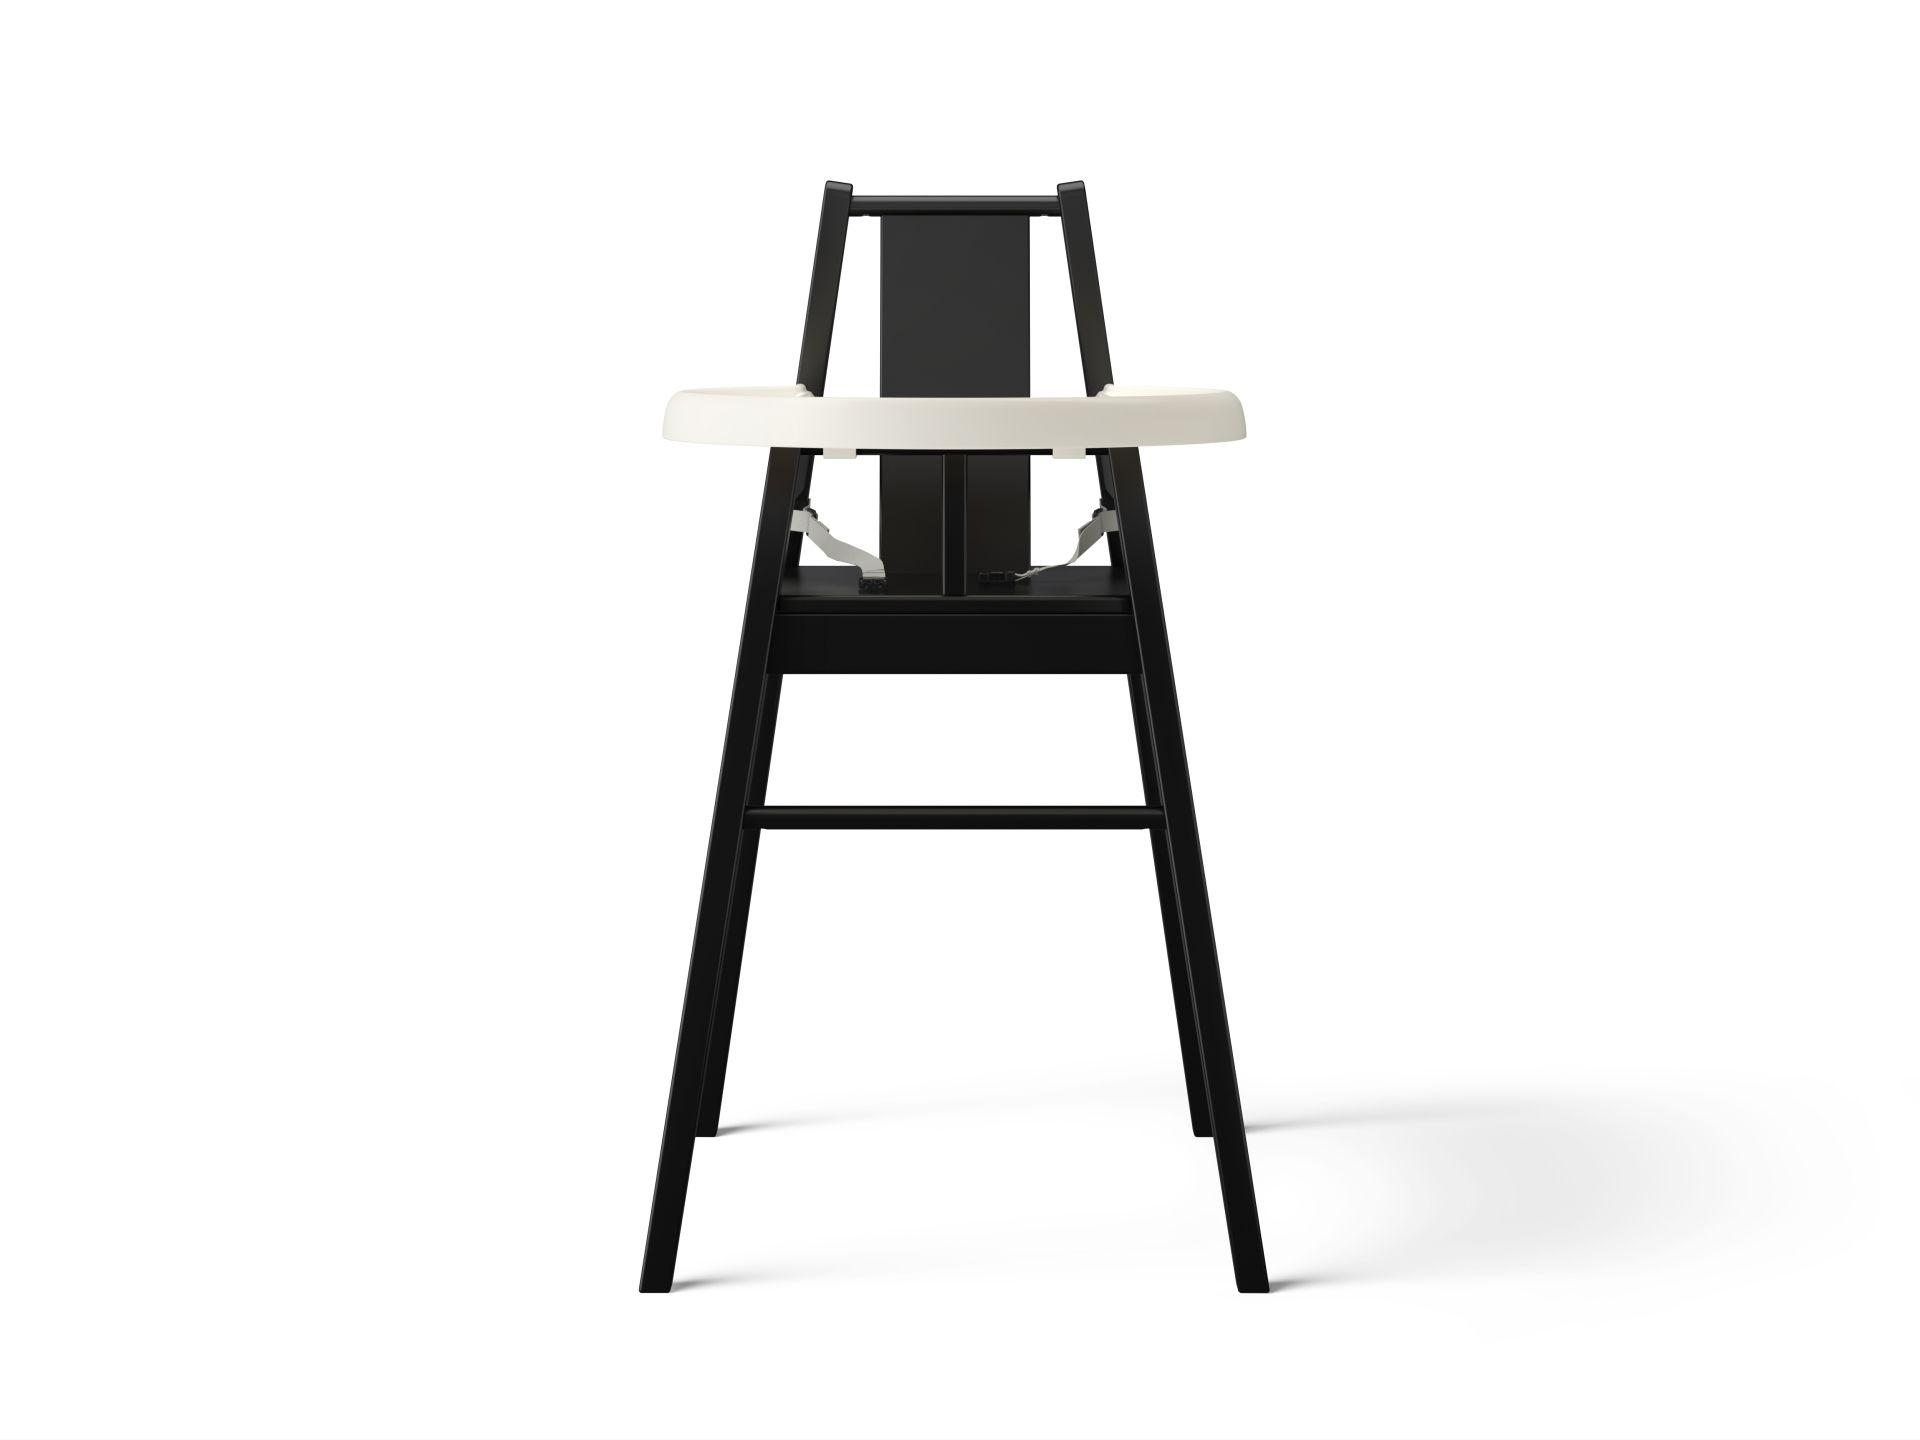 Kinderstoel Hoge Tafel.Blames Hoge Kinderstoel Met Blad Zwart Ikea Catalogus 2017 Ikea